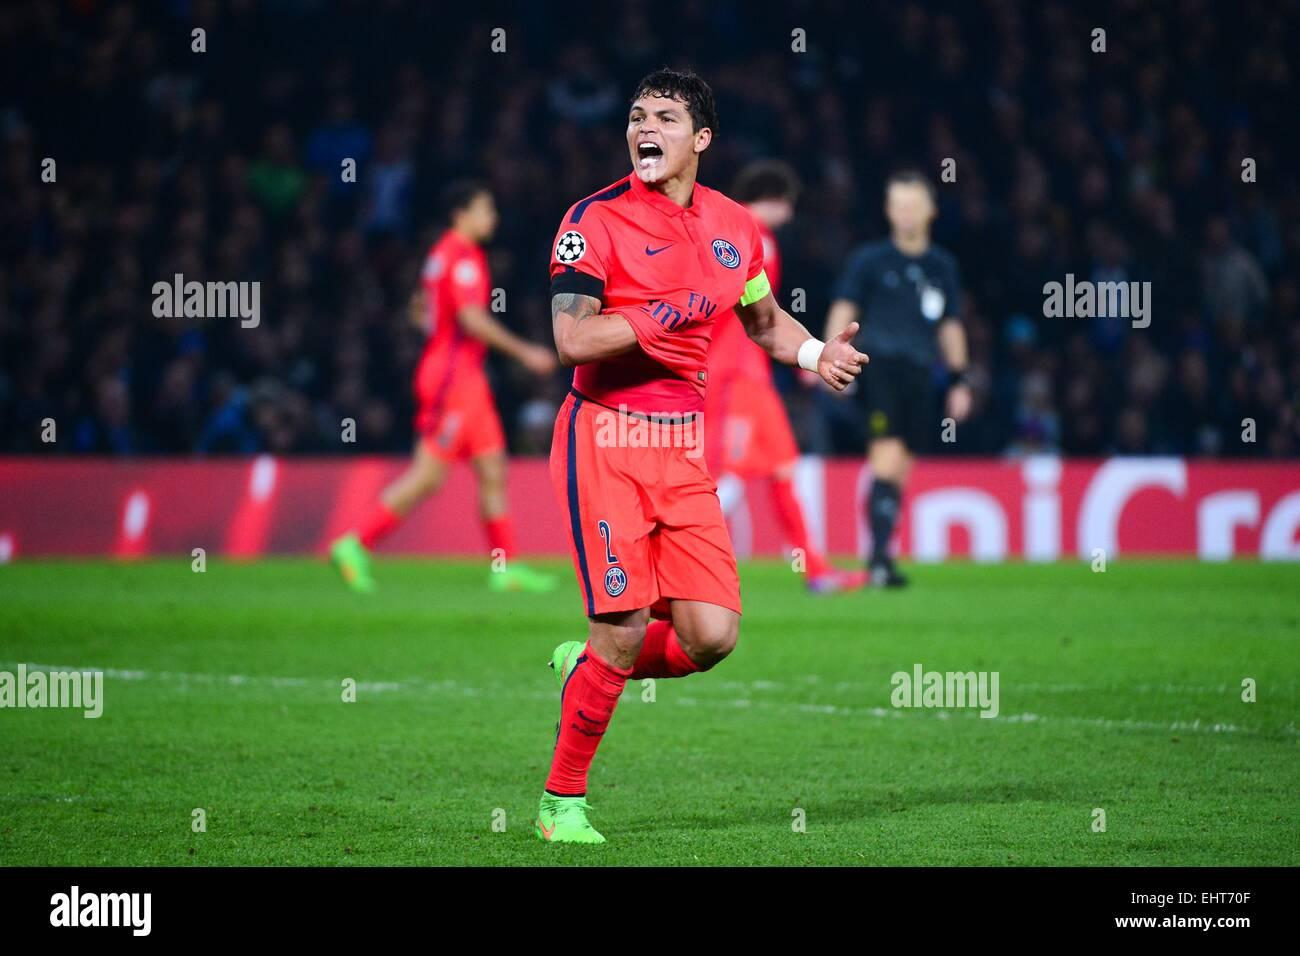 44bfbcd638 Joie Thiago SILVA - 11.03.2015 - Chelsea / Paris Saint Germain - 1/